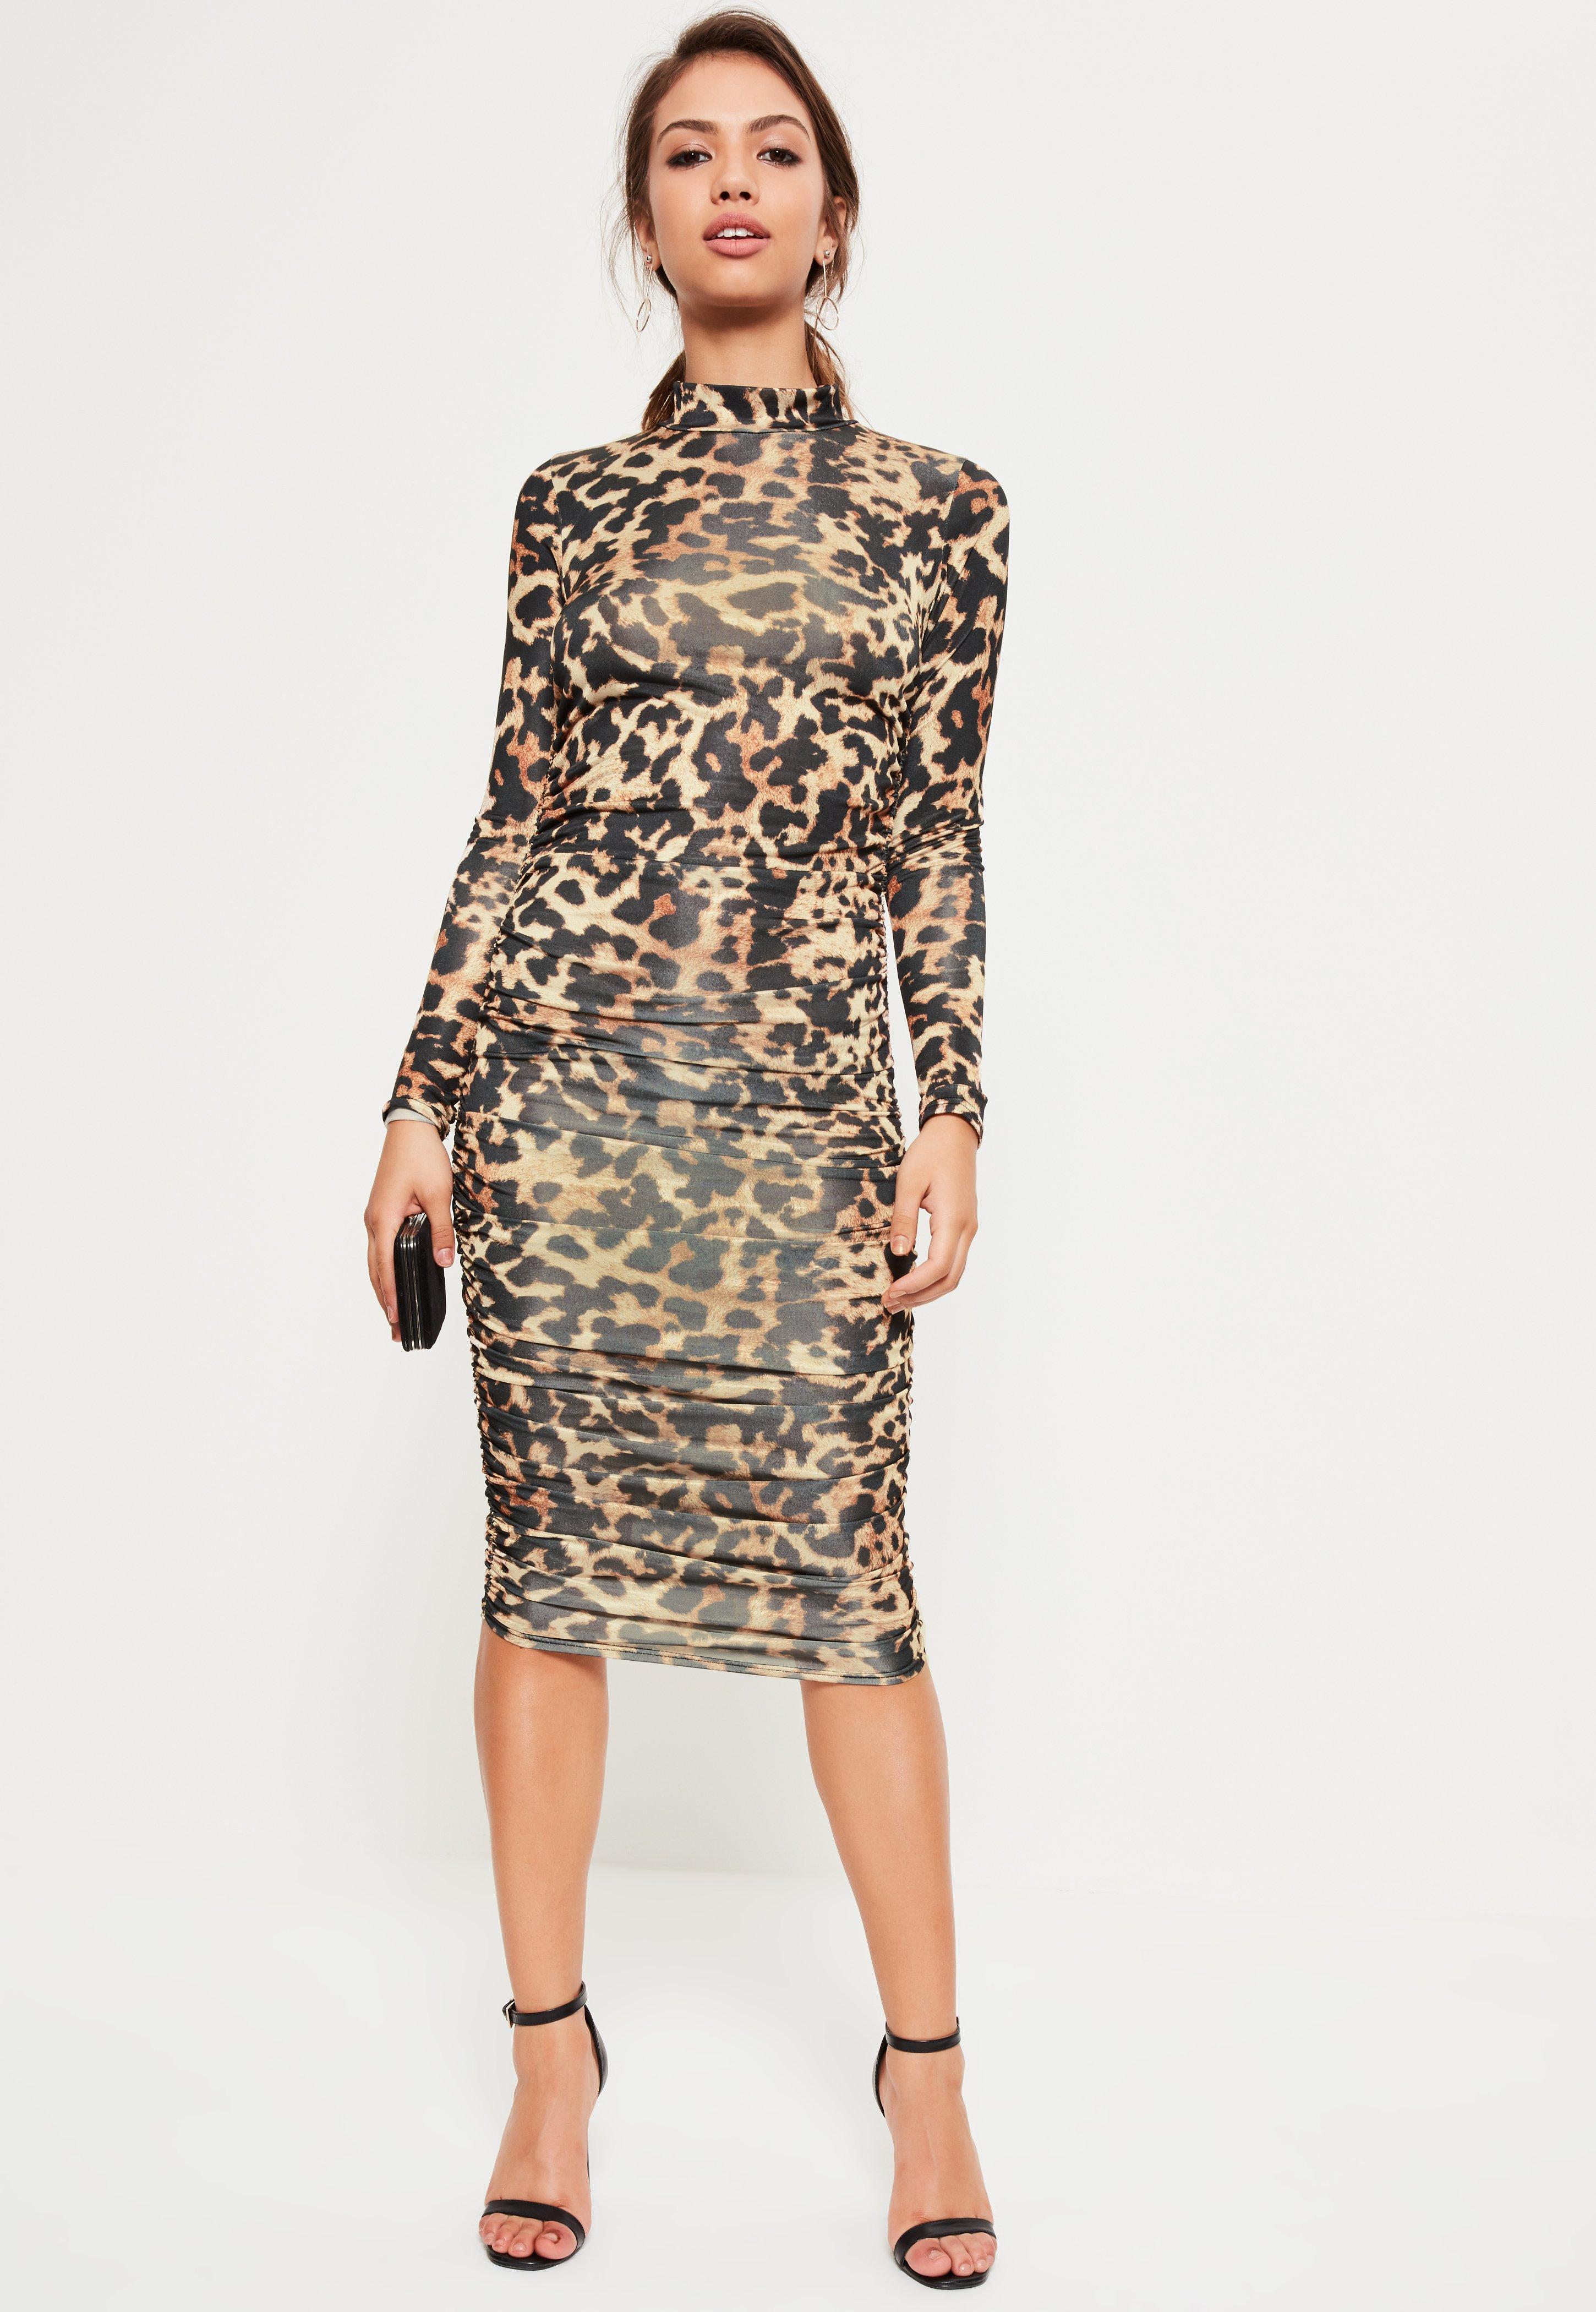 Brown Leopard High Neck Ruched Dress